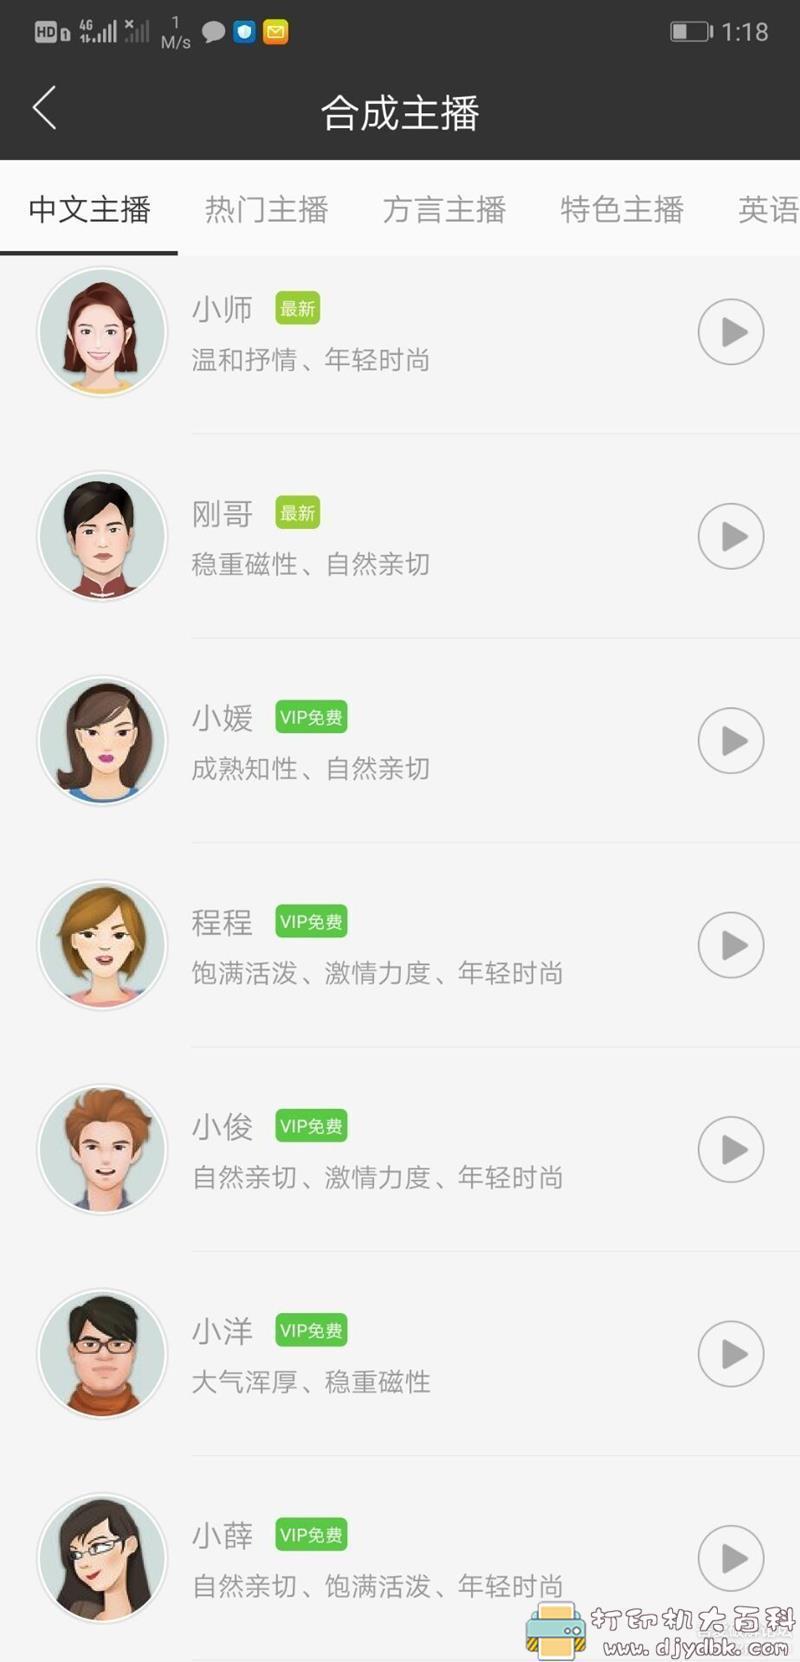 [Android]文字转语音工具,讯飞配音,全主播可用免付费图片 No.1